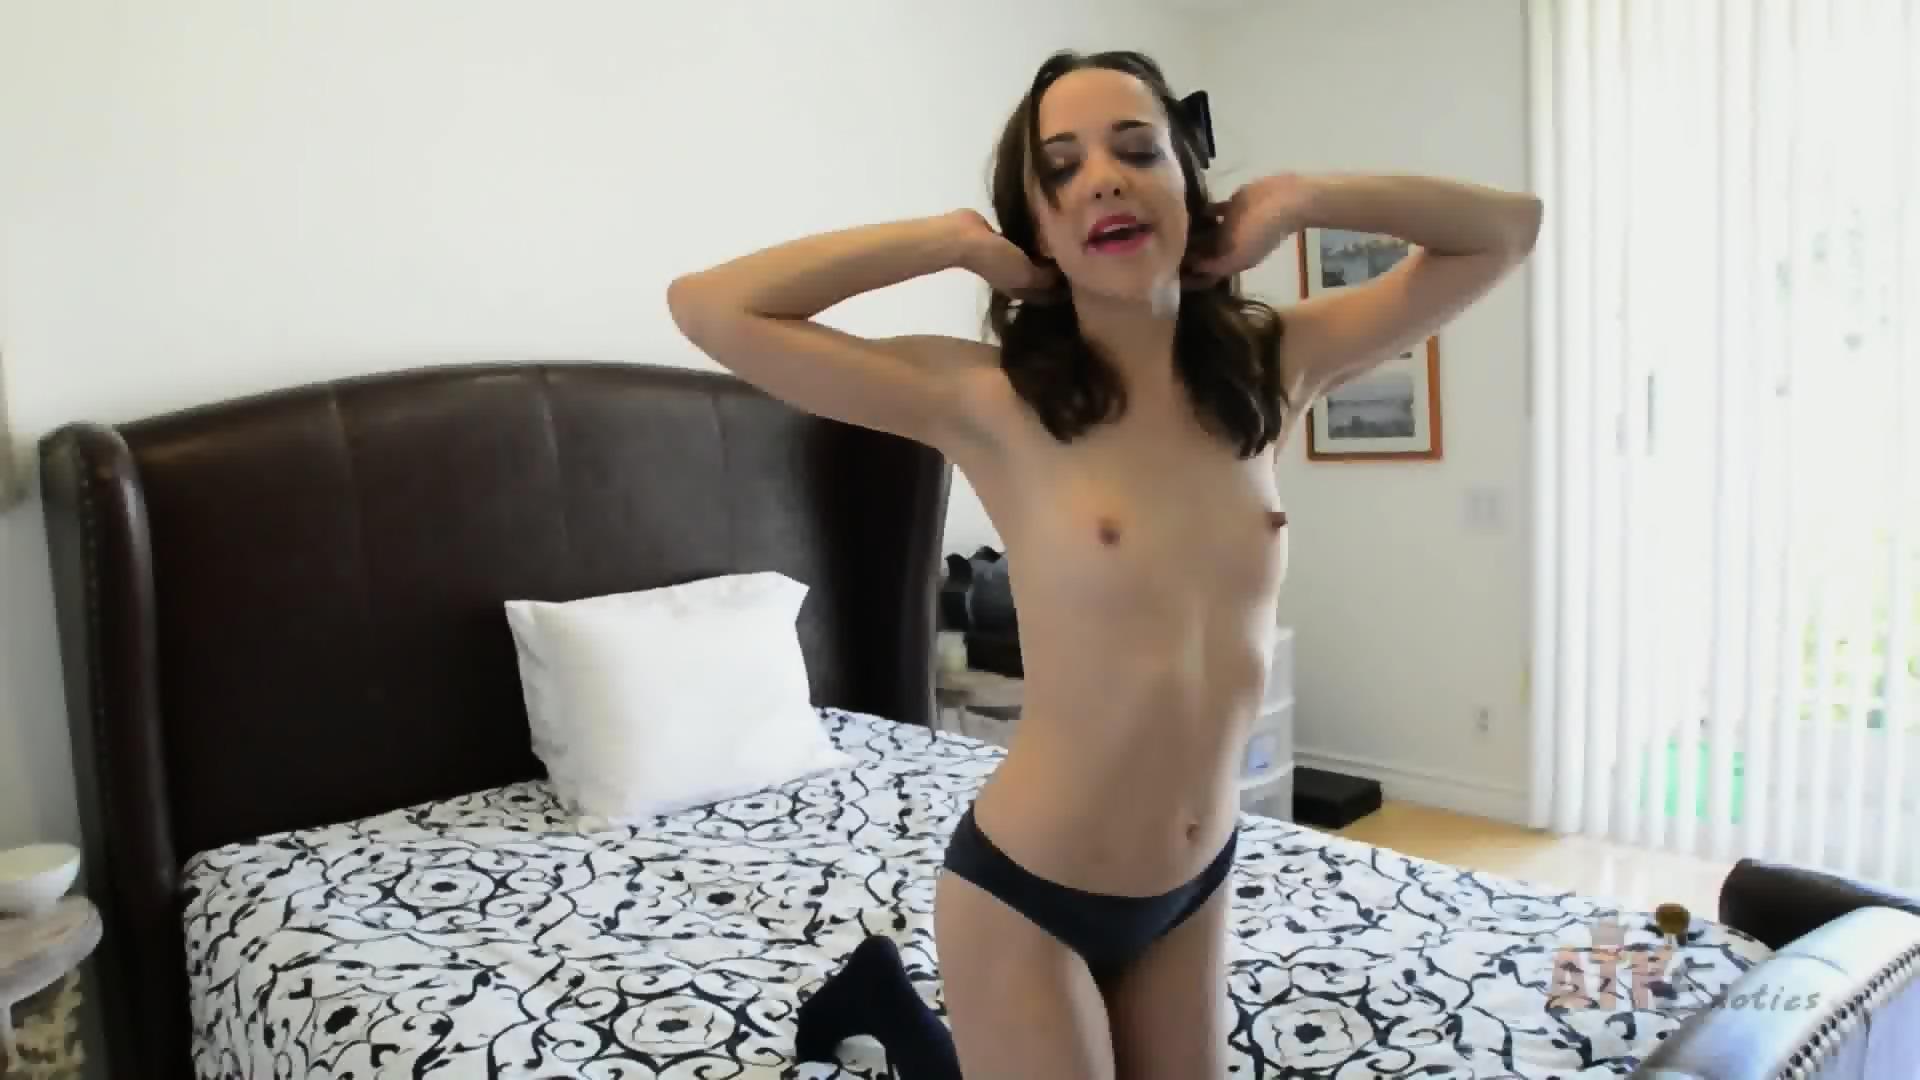 Russian lesbian sex shows